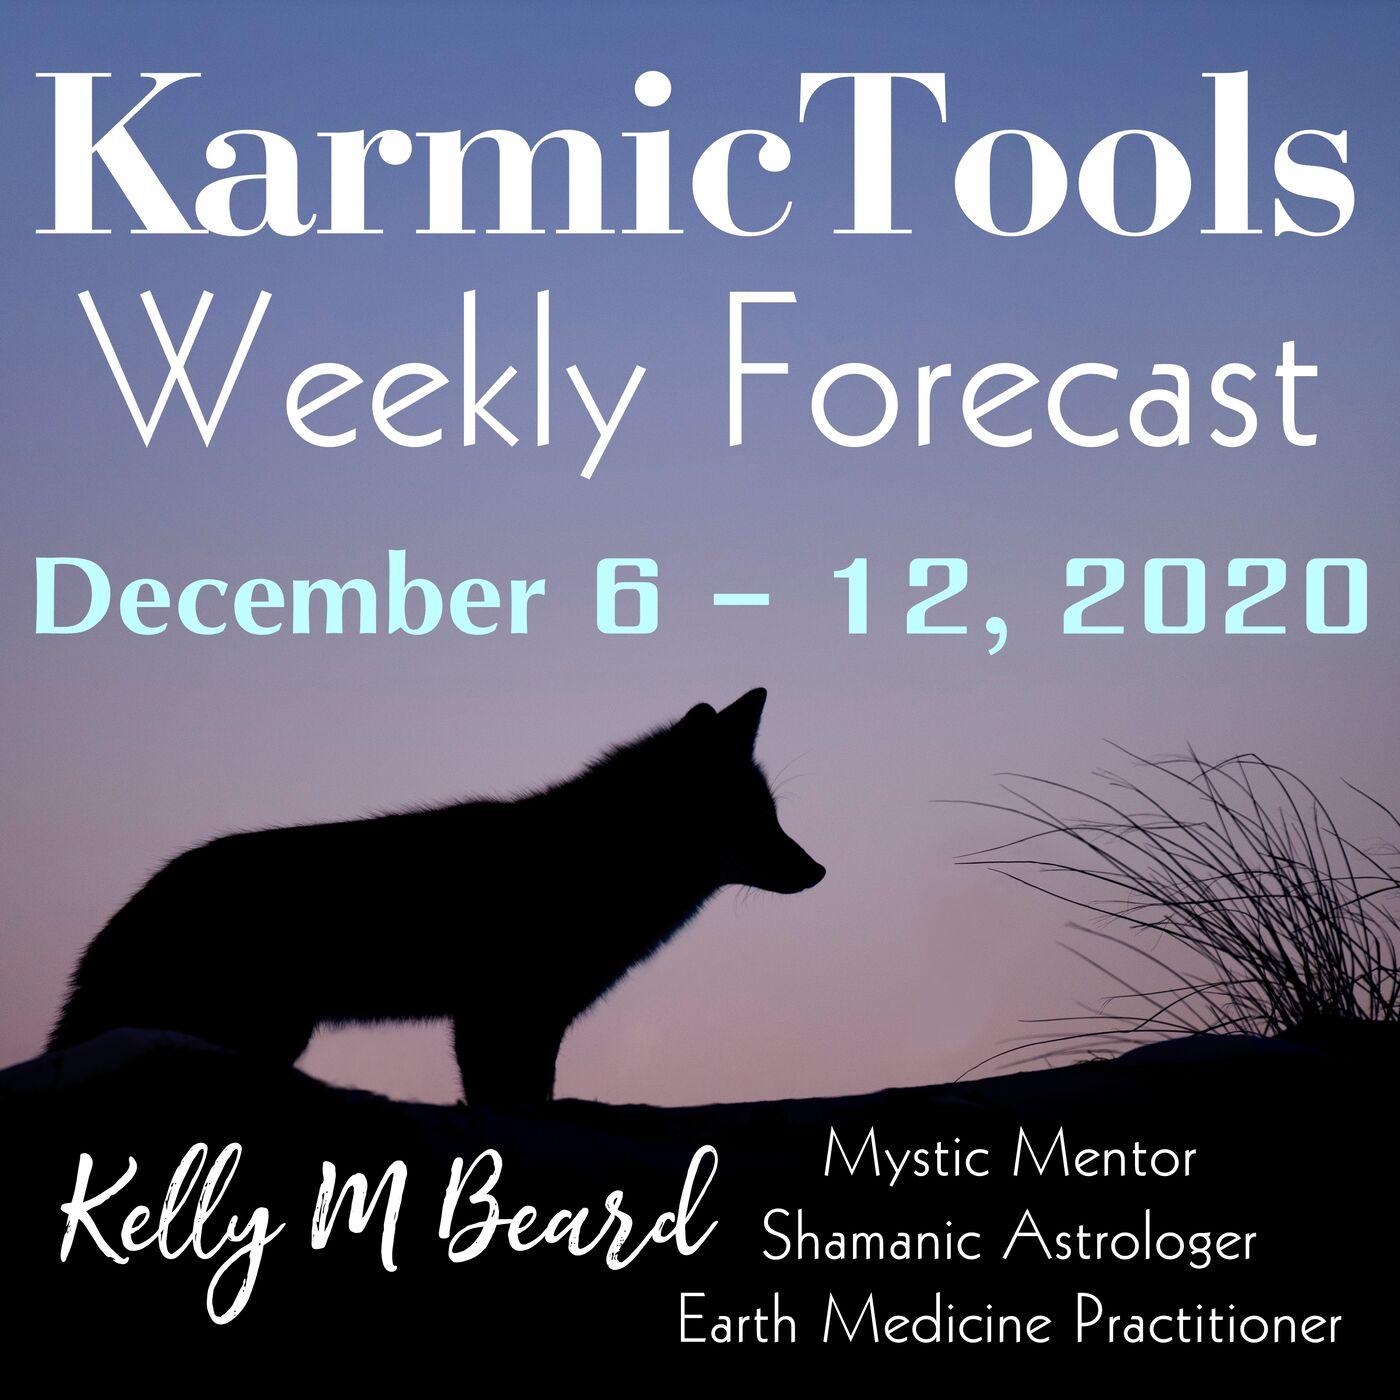 Dec 6 - 12, 2020 KarmicTools Weekly Forecast